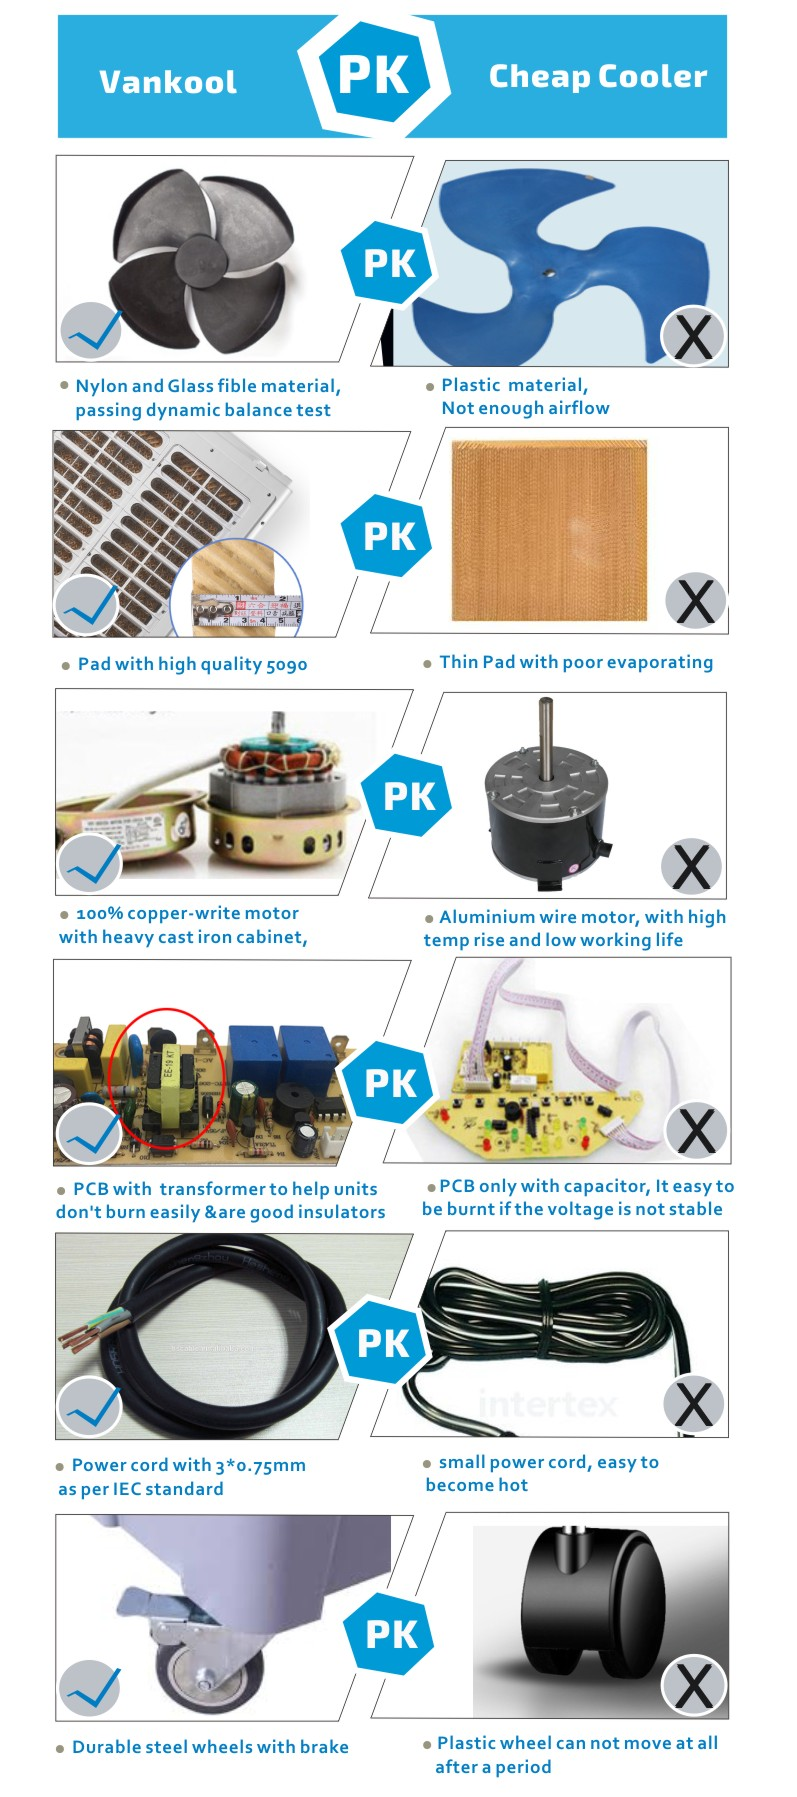 Enfriador de aire Vankool VERSUS climatizador portatil barato